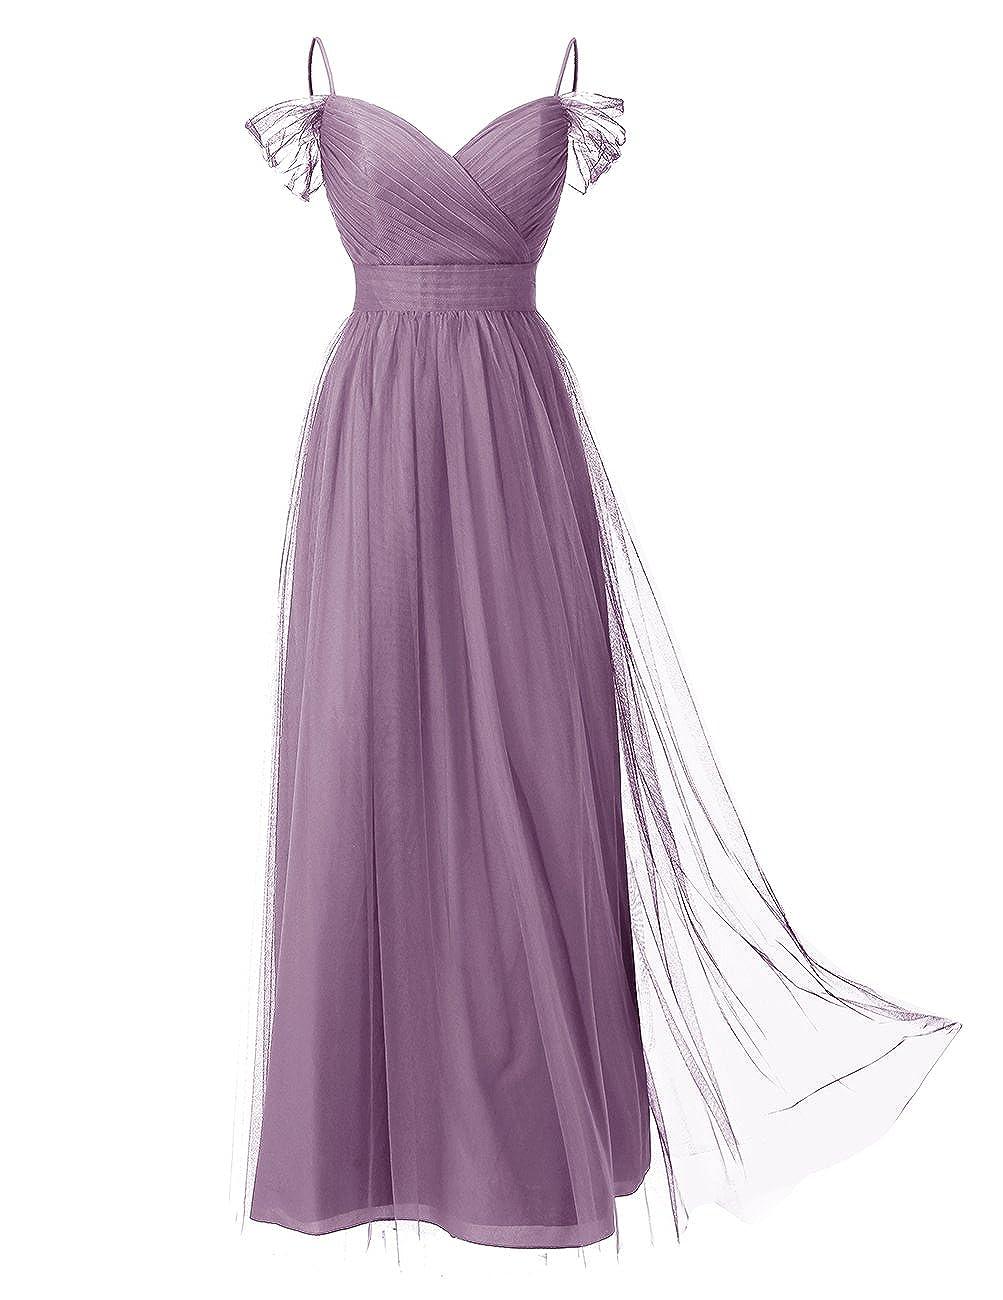 Downton Abbey Inspired Dresses DRESSTELLS Long Prom Dress Tulle Off Shoulder Bridesmaid Dress with Pleat $79.99 AT vintagedancer.com